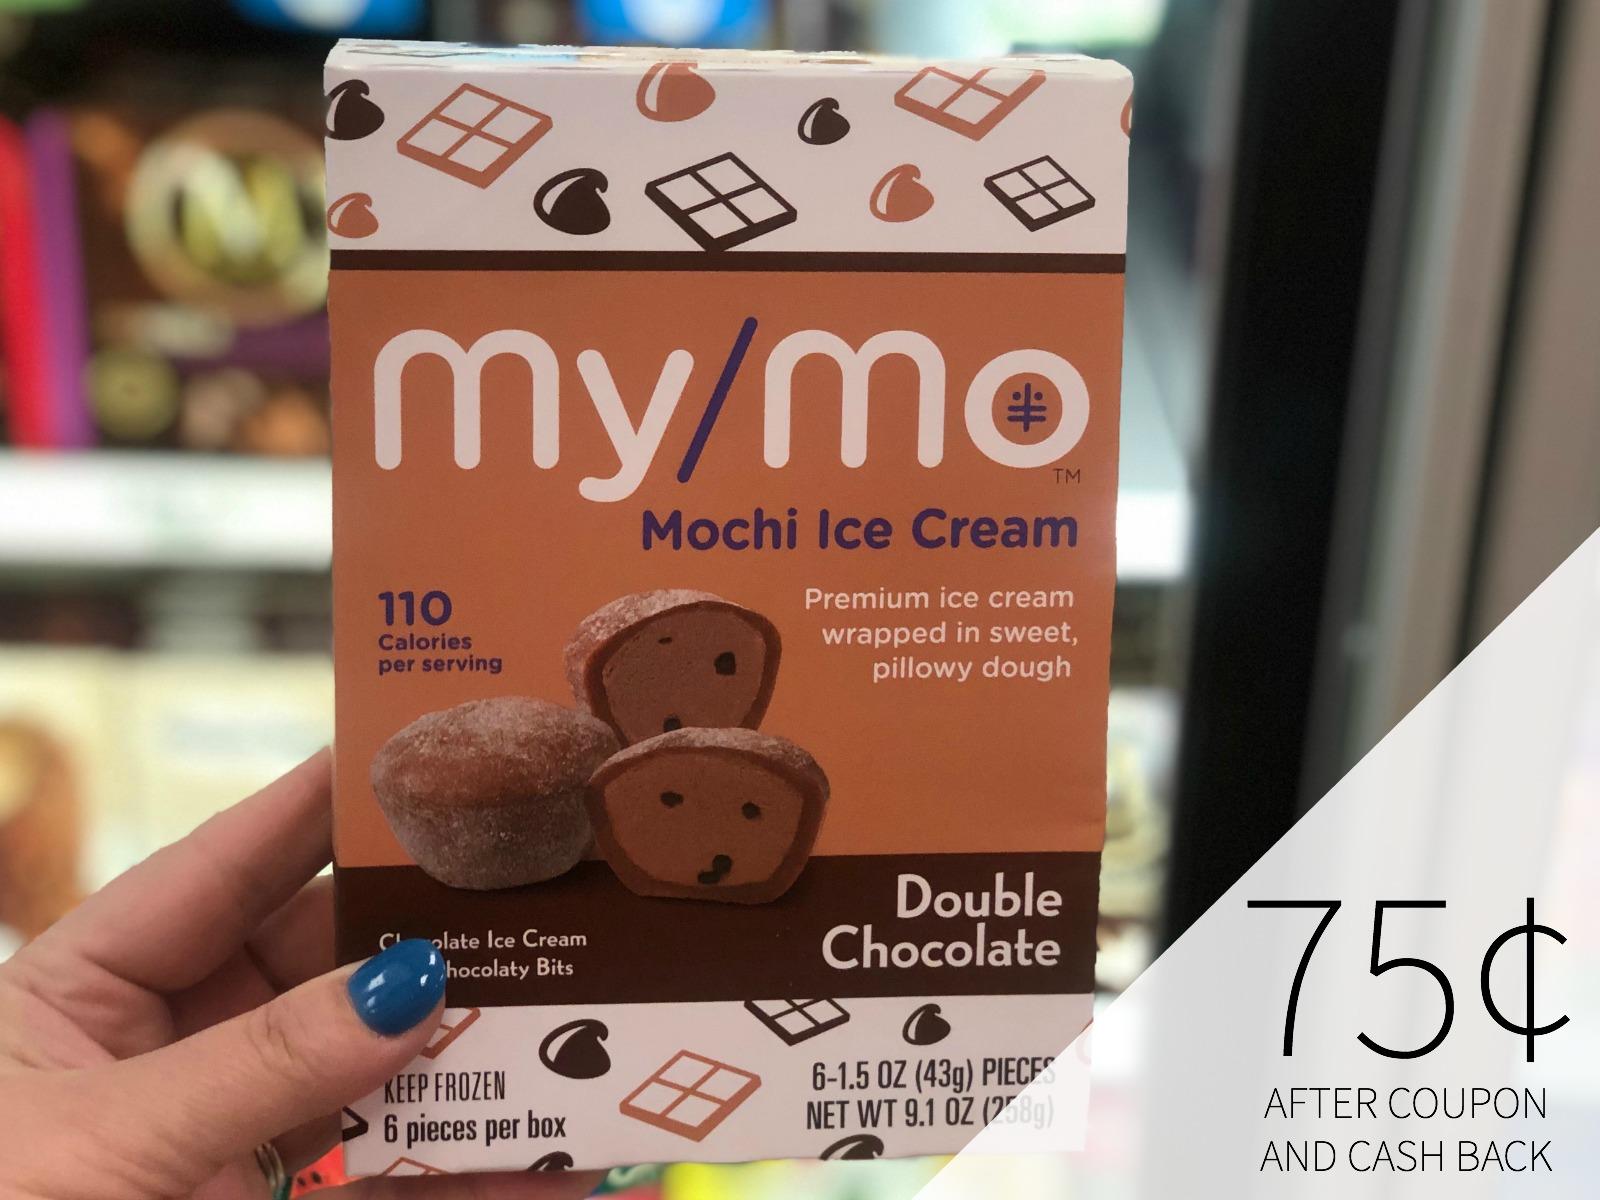 My/Mo Mochi Ice Cream Just $1.75 At Publix on I Heart Publix